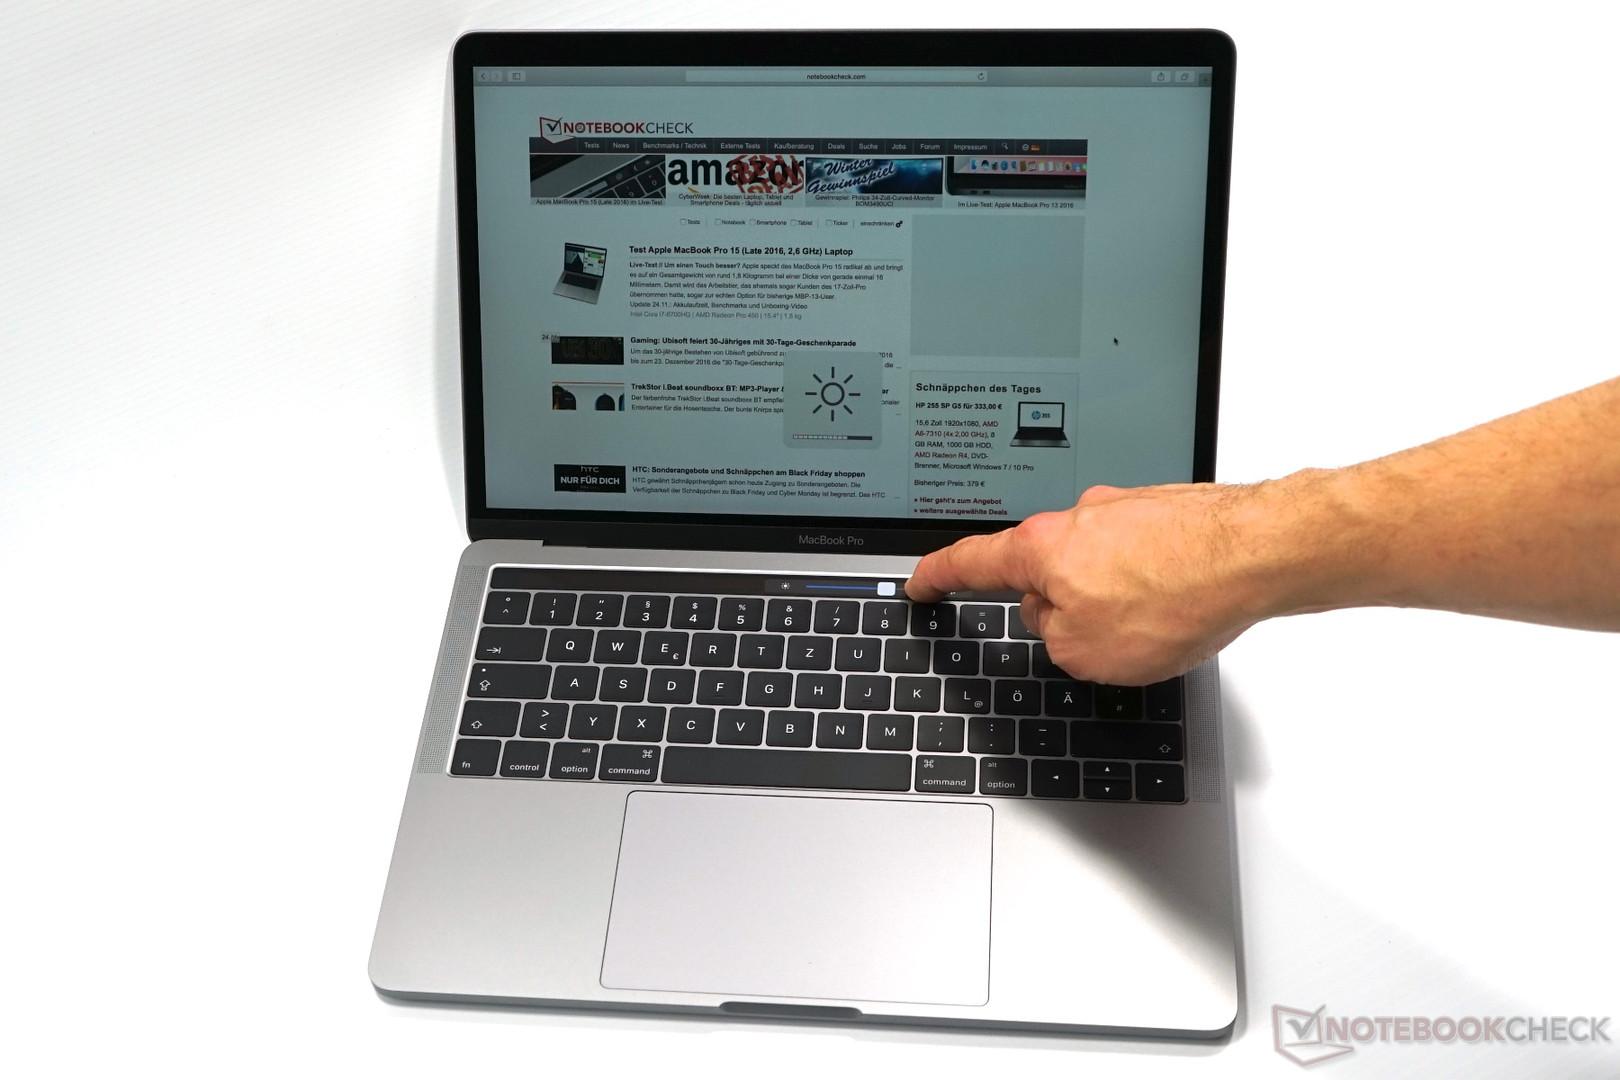 Jual Acer Aspire F15 Univerzln Patnctka Pro Studenty Za 19 000 K Jam Tangan Wanita Charles Jourdan Cj1002 2552 Rose Gold Original Apple Macbook 13 2016 29 Ghz I5 Touch Bar